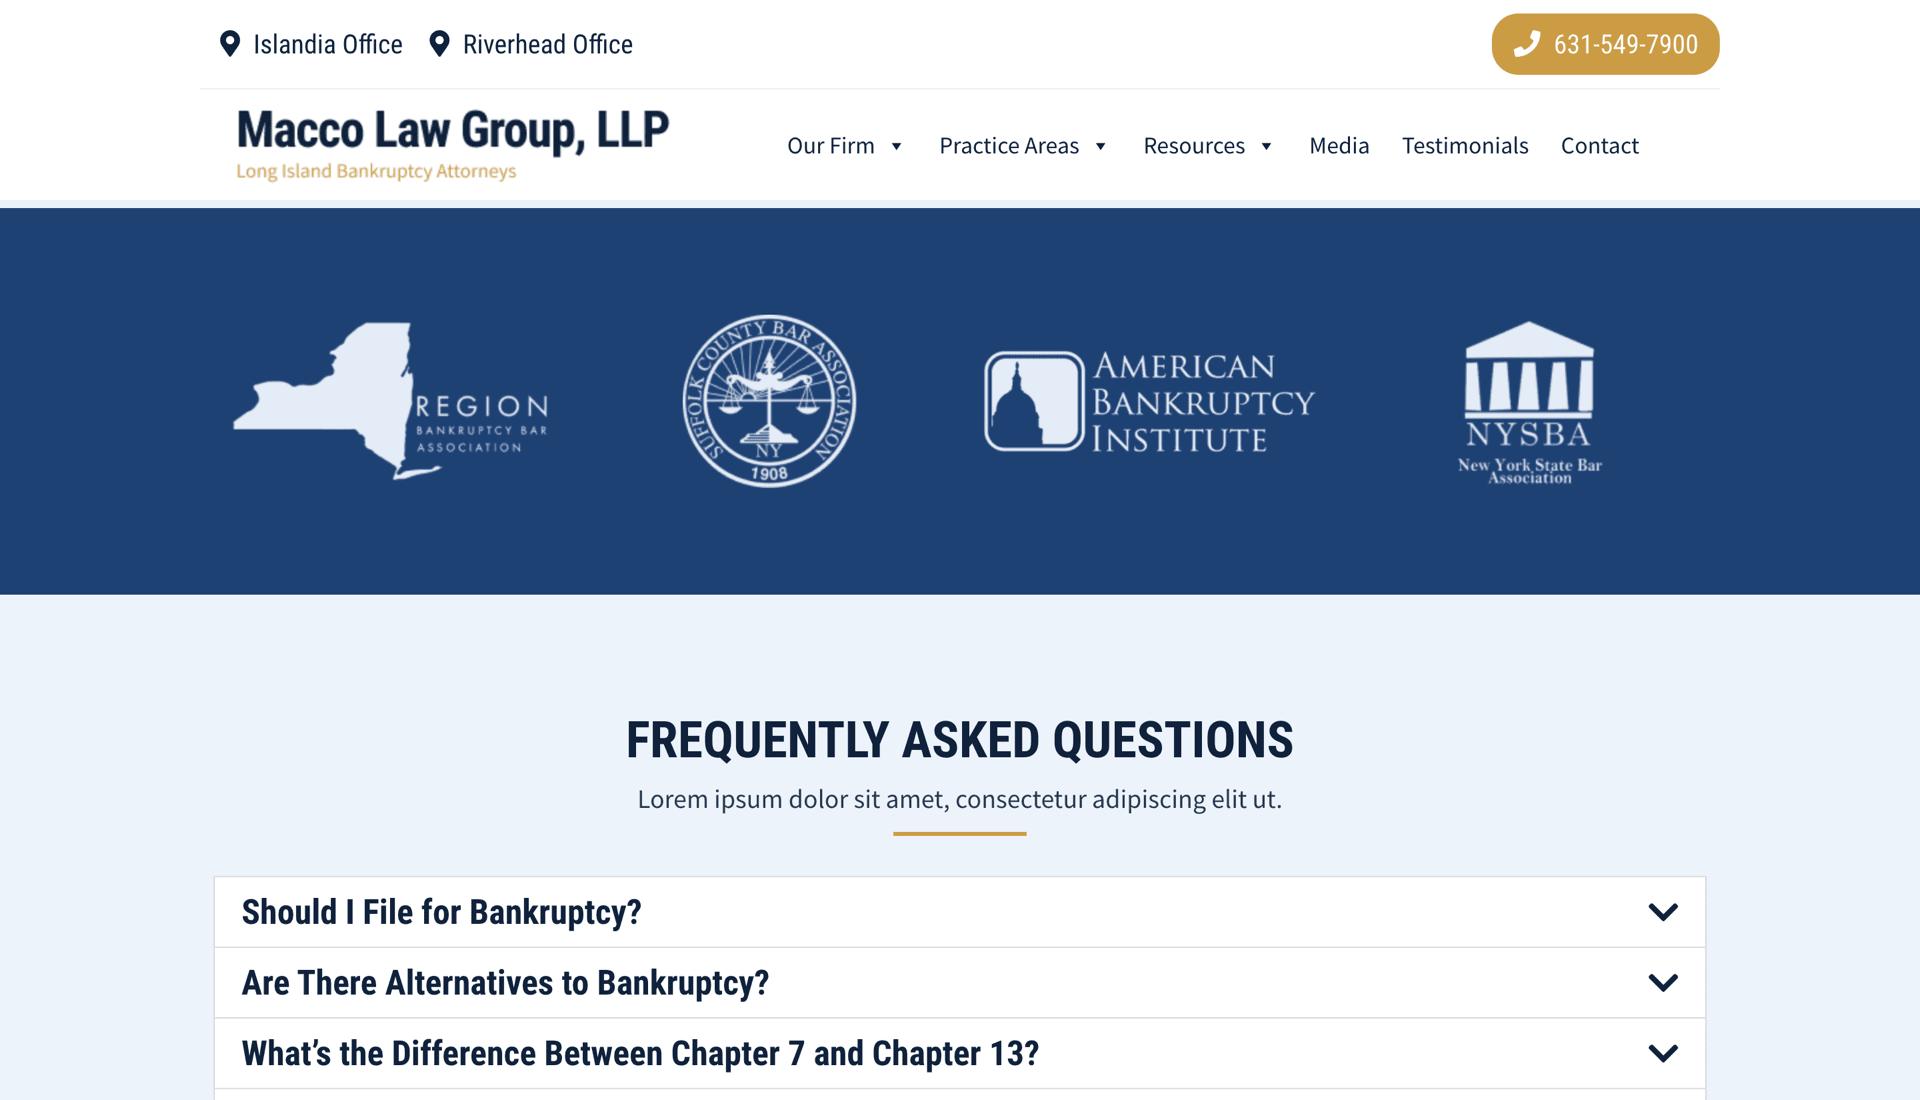 Macco Law Group, LLP